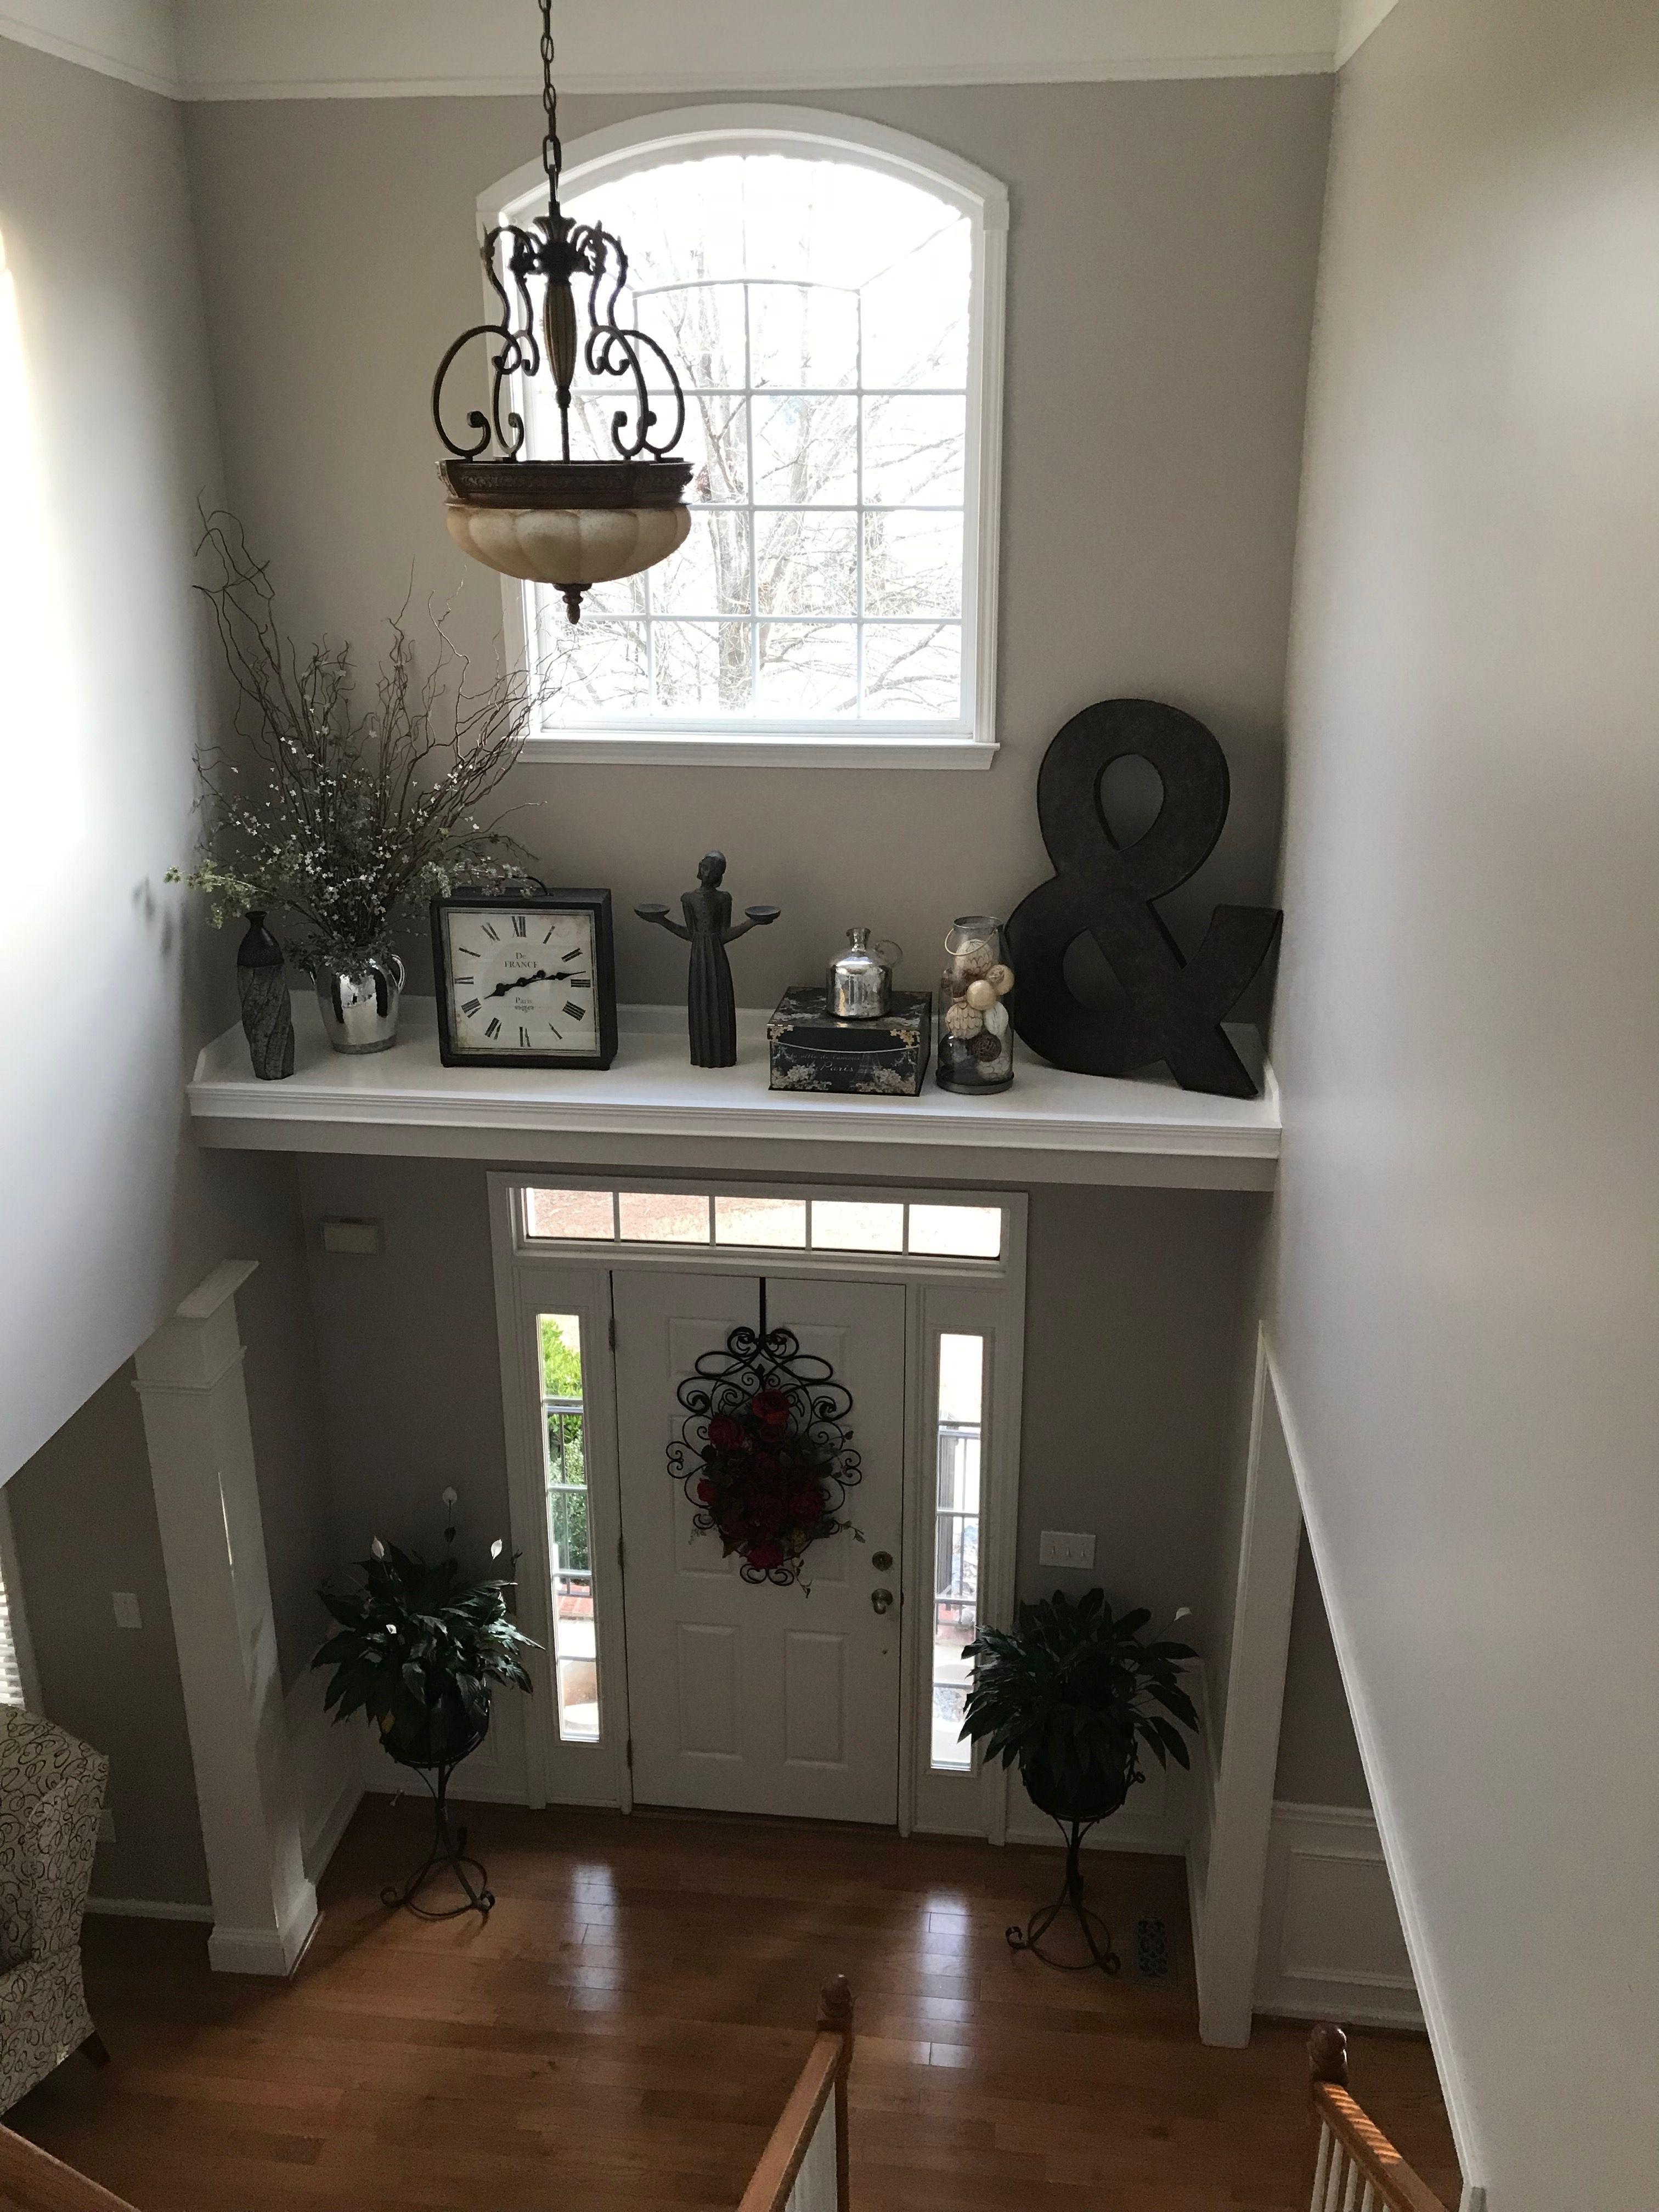 Home Remodel Ideas Doorway Decor Ledge Decor Niche Decor Living room vaulted ceiling ledge